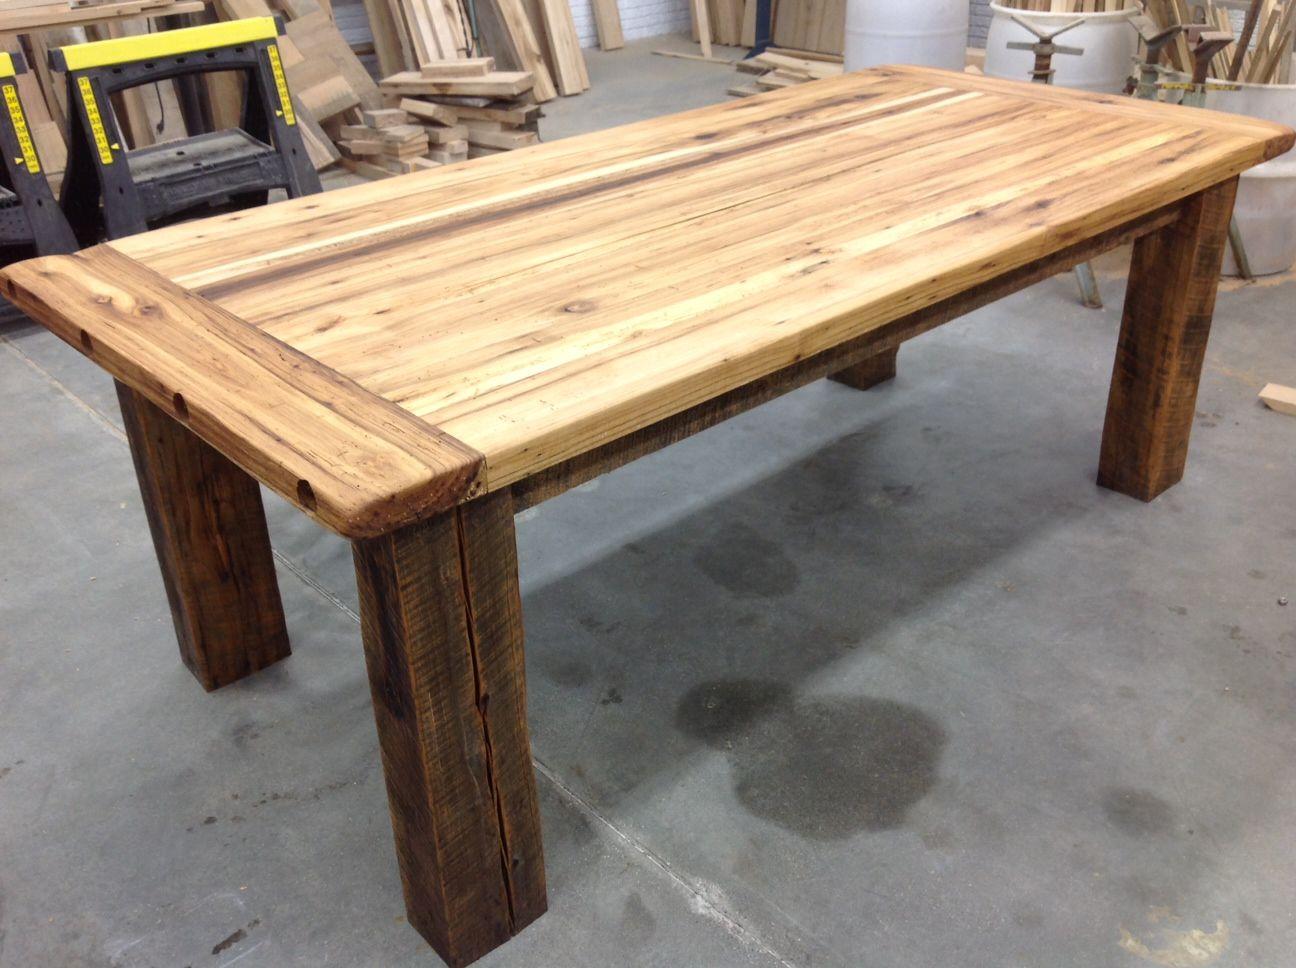 Classic Farmhouse Style Hickory Lane Reclaimed Wood Table Wood Table Reclaimed Dining Table